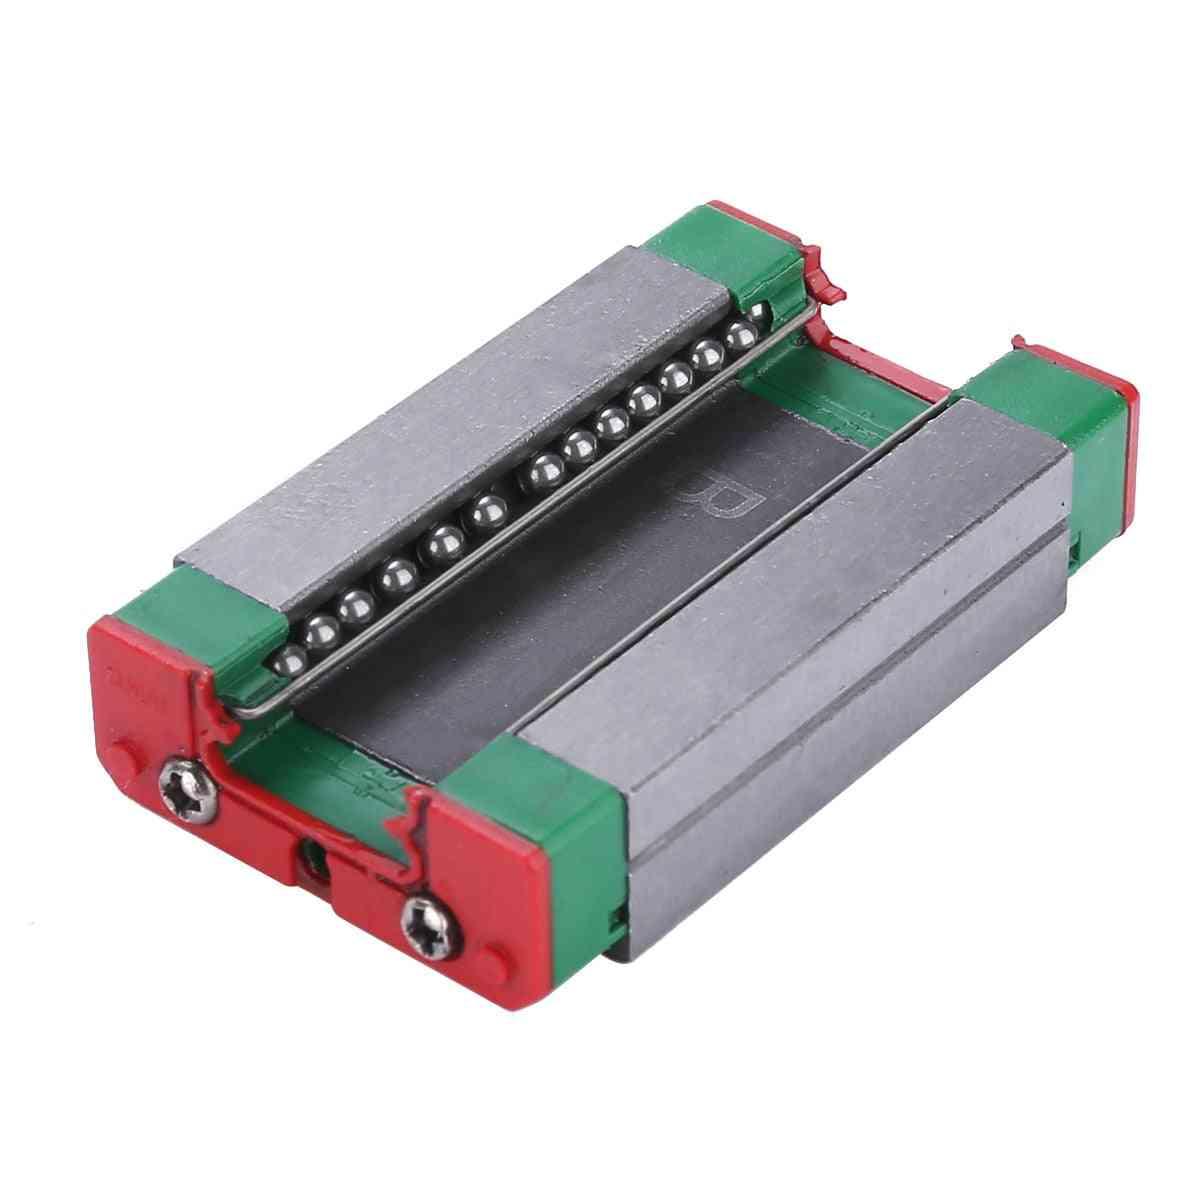 Steel Sliding Block, Durable Linear Guide